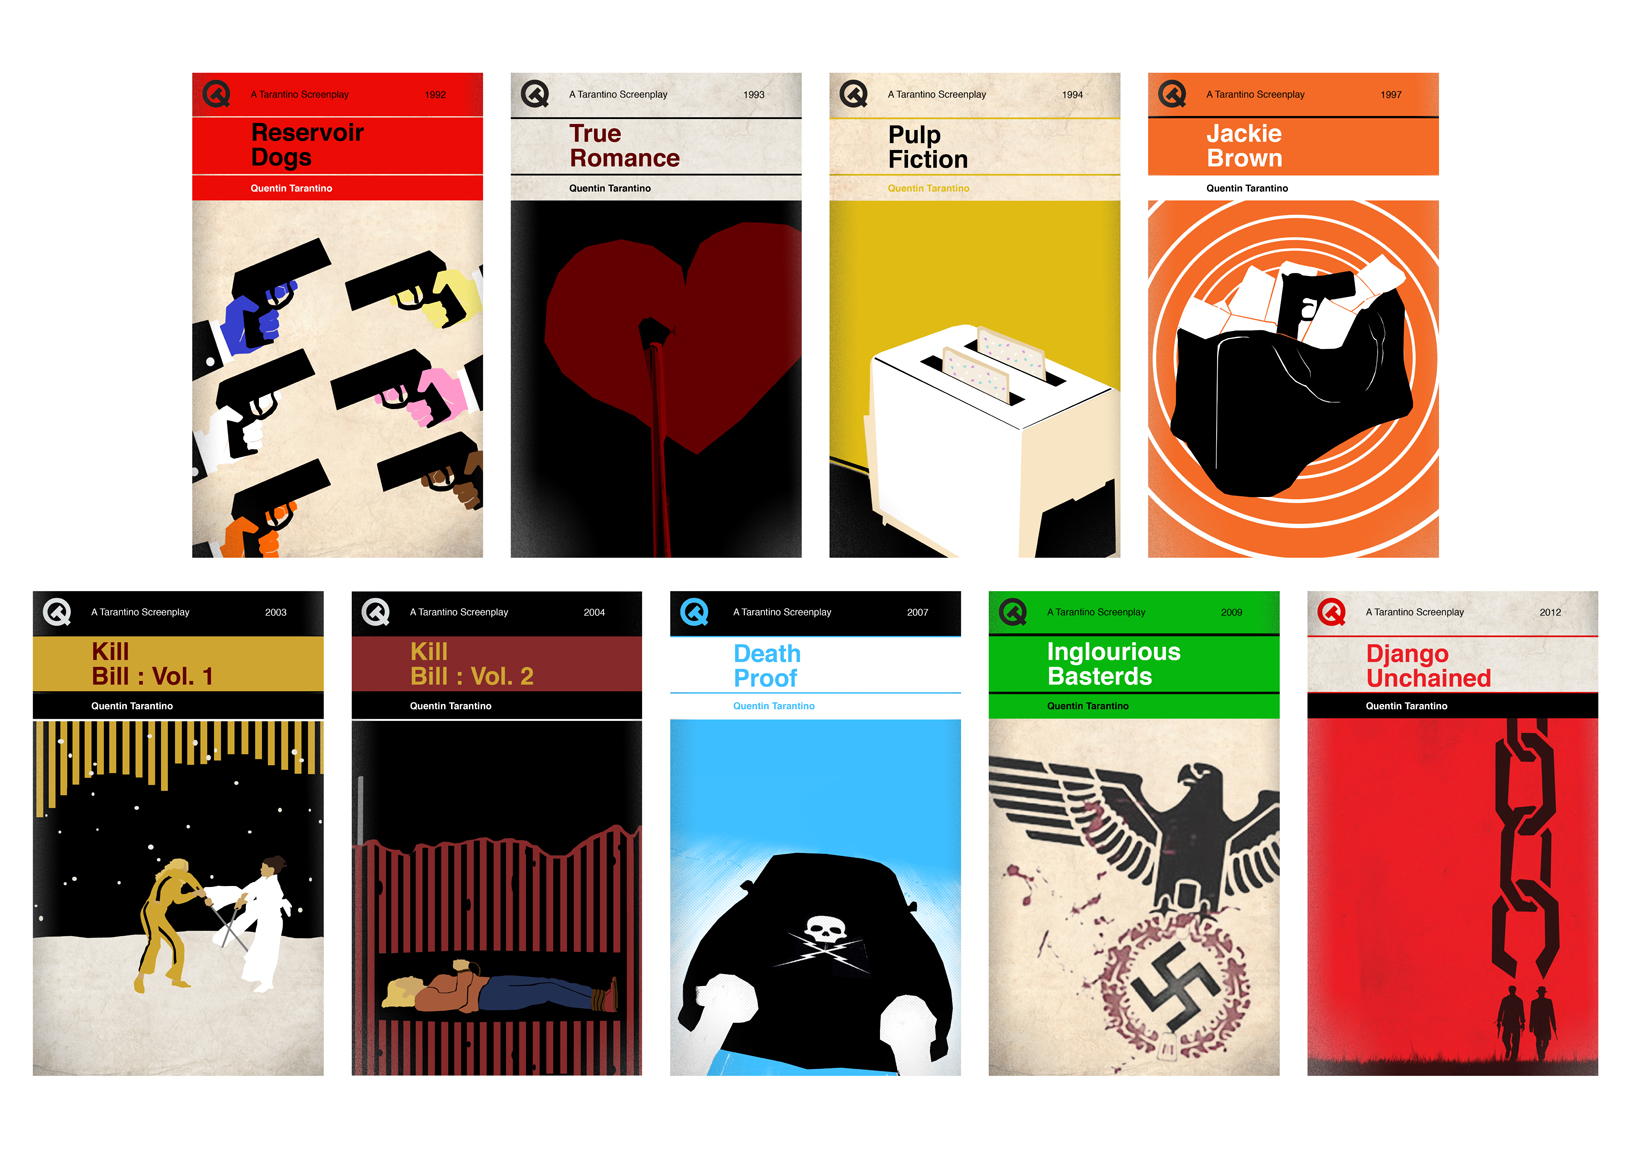 13.03.15_Tarantino%20screenplay%20covers%20websize_1_o